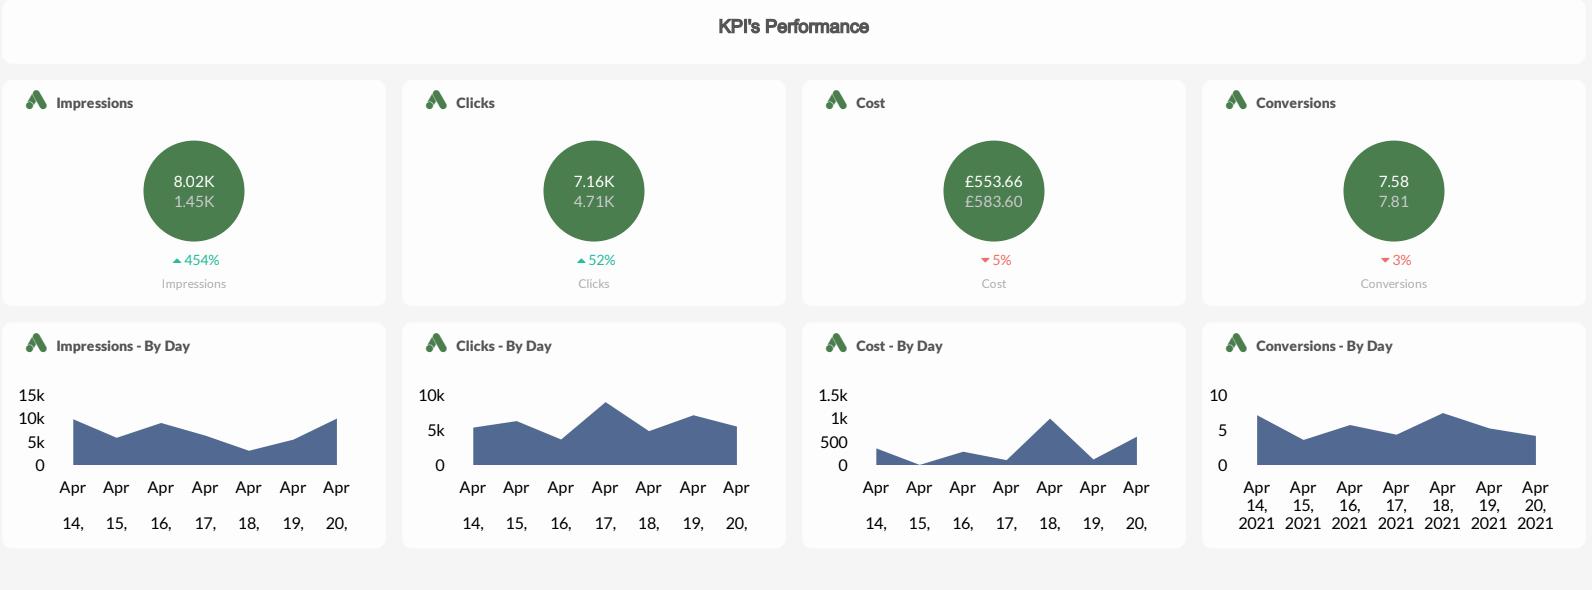 TapClicks Google Ads Dashboard example: KPI's Performance